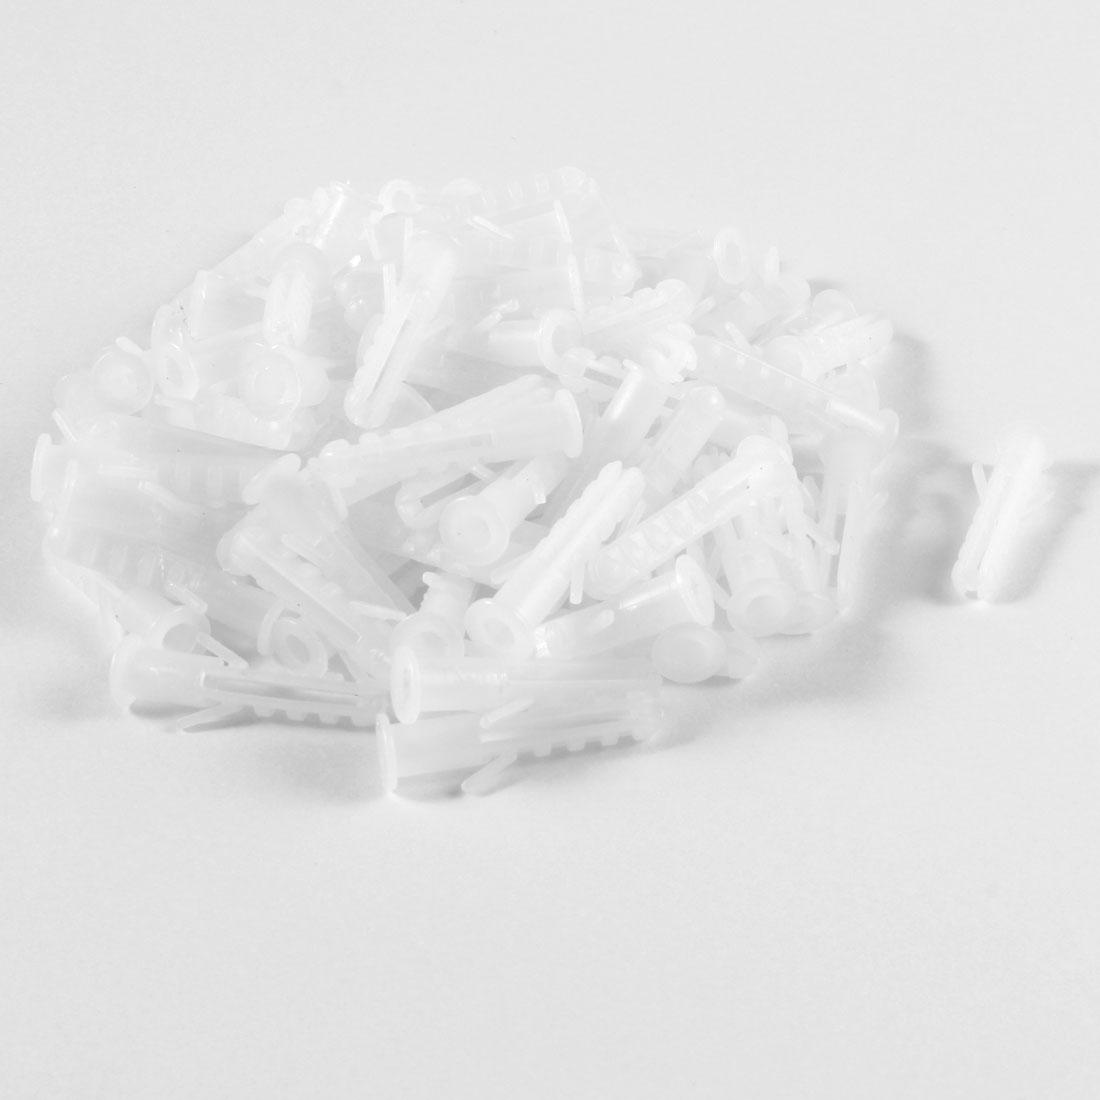 100 Pcs 6mm Diameter White Plastic Rimless Expansion Wall Plug